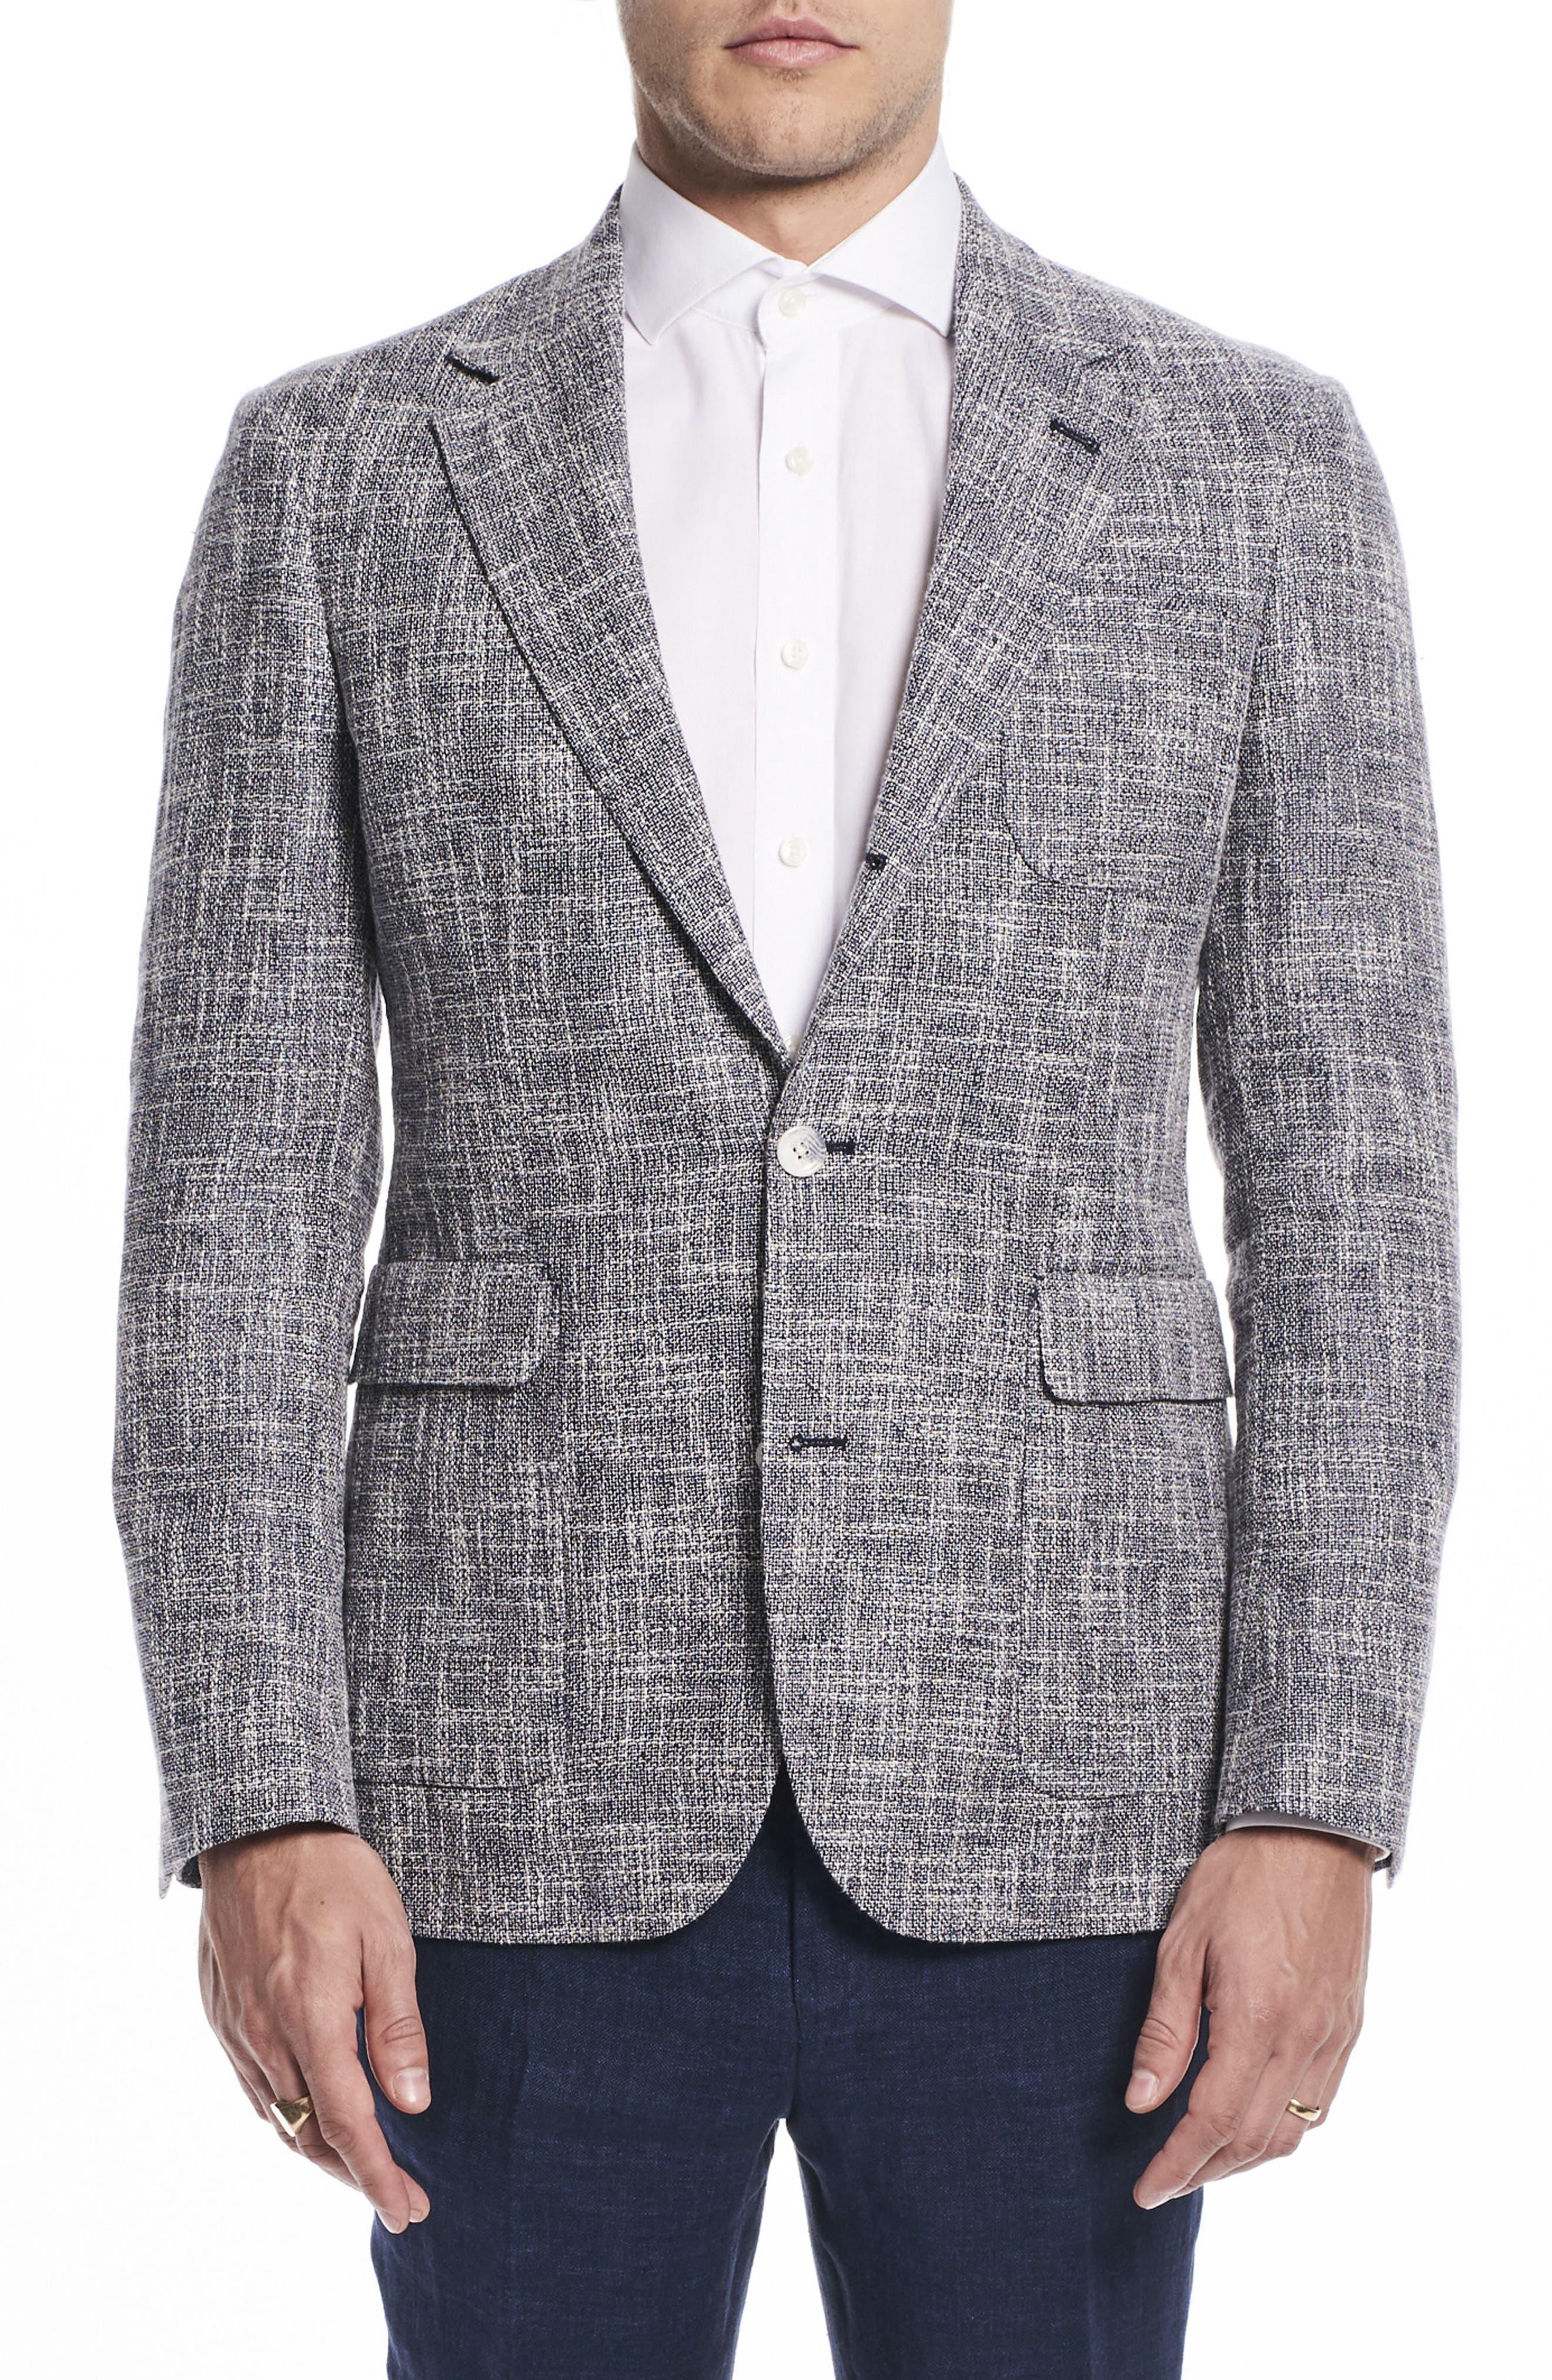 Strong Suit by Ilaria Urbinati Ignatius Slim Fit Linen & Cotton Blazer (Nordstrom Exclusive)